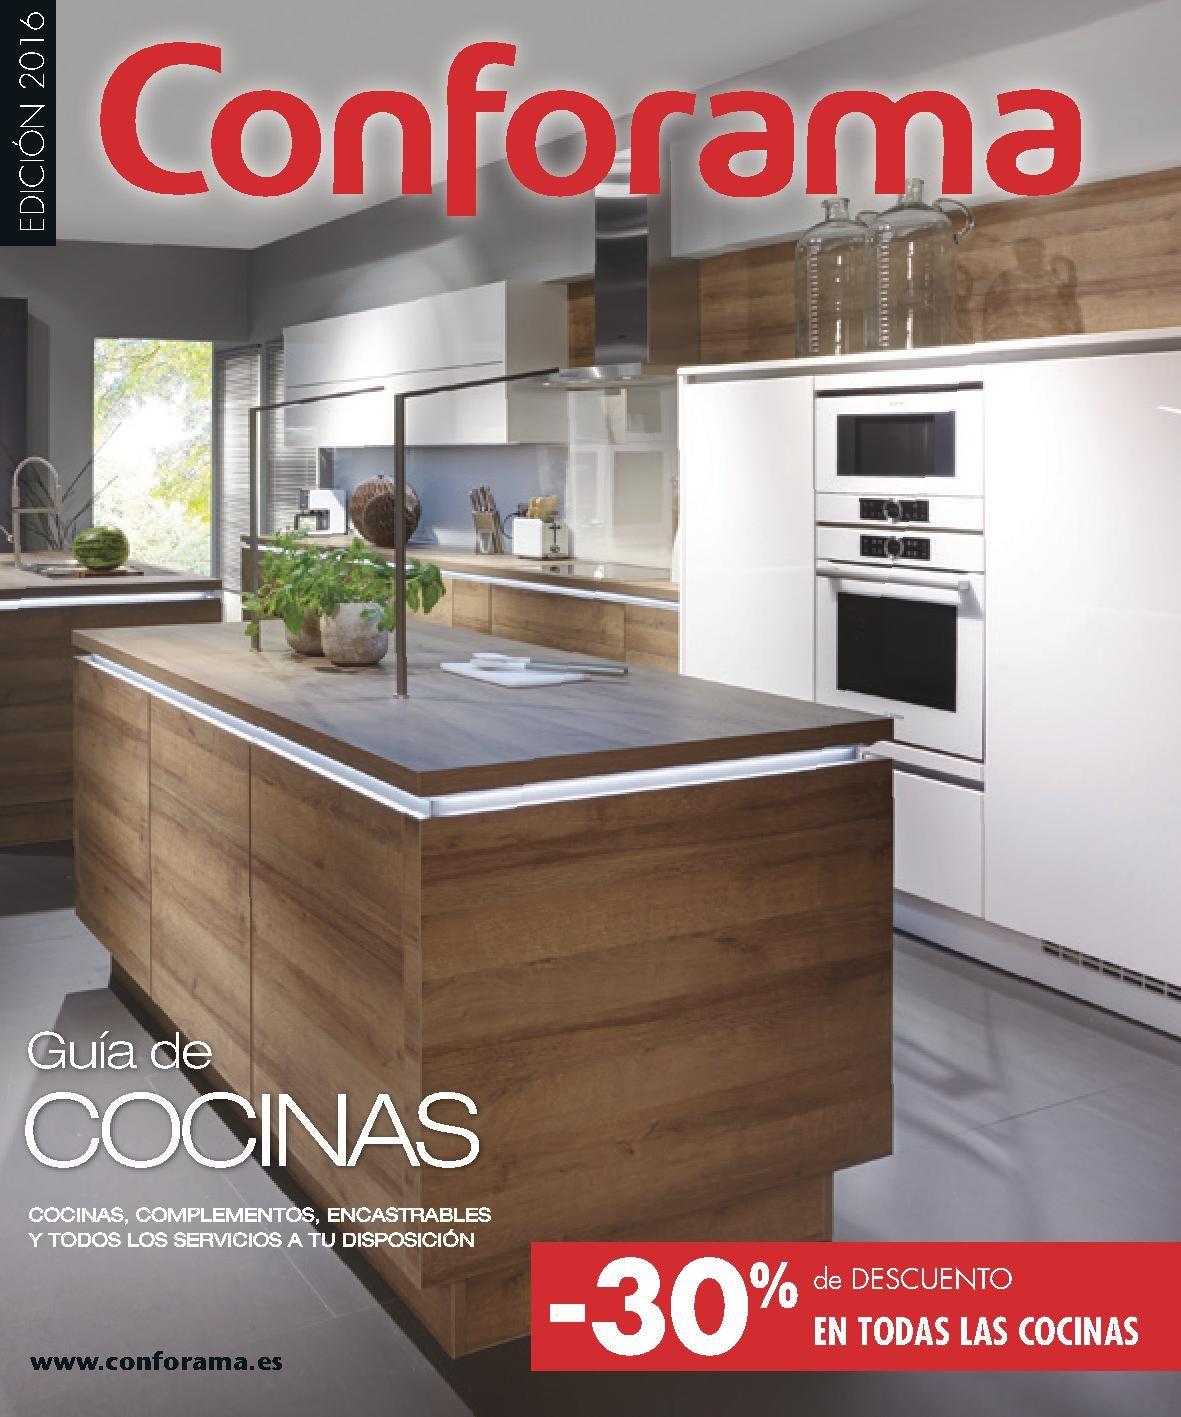 Cocinas conforama 2018 precios ofertas cocina for Cocinas hergom catalogo